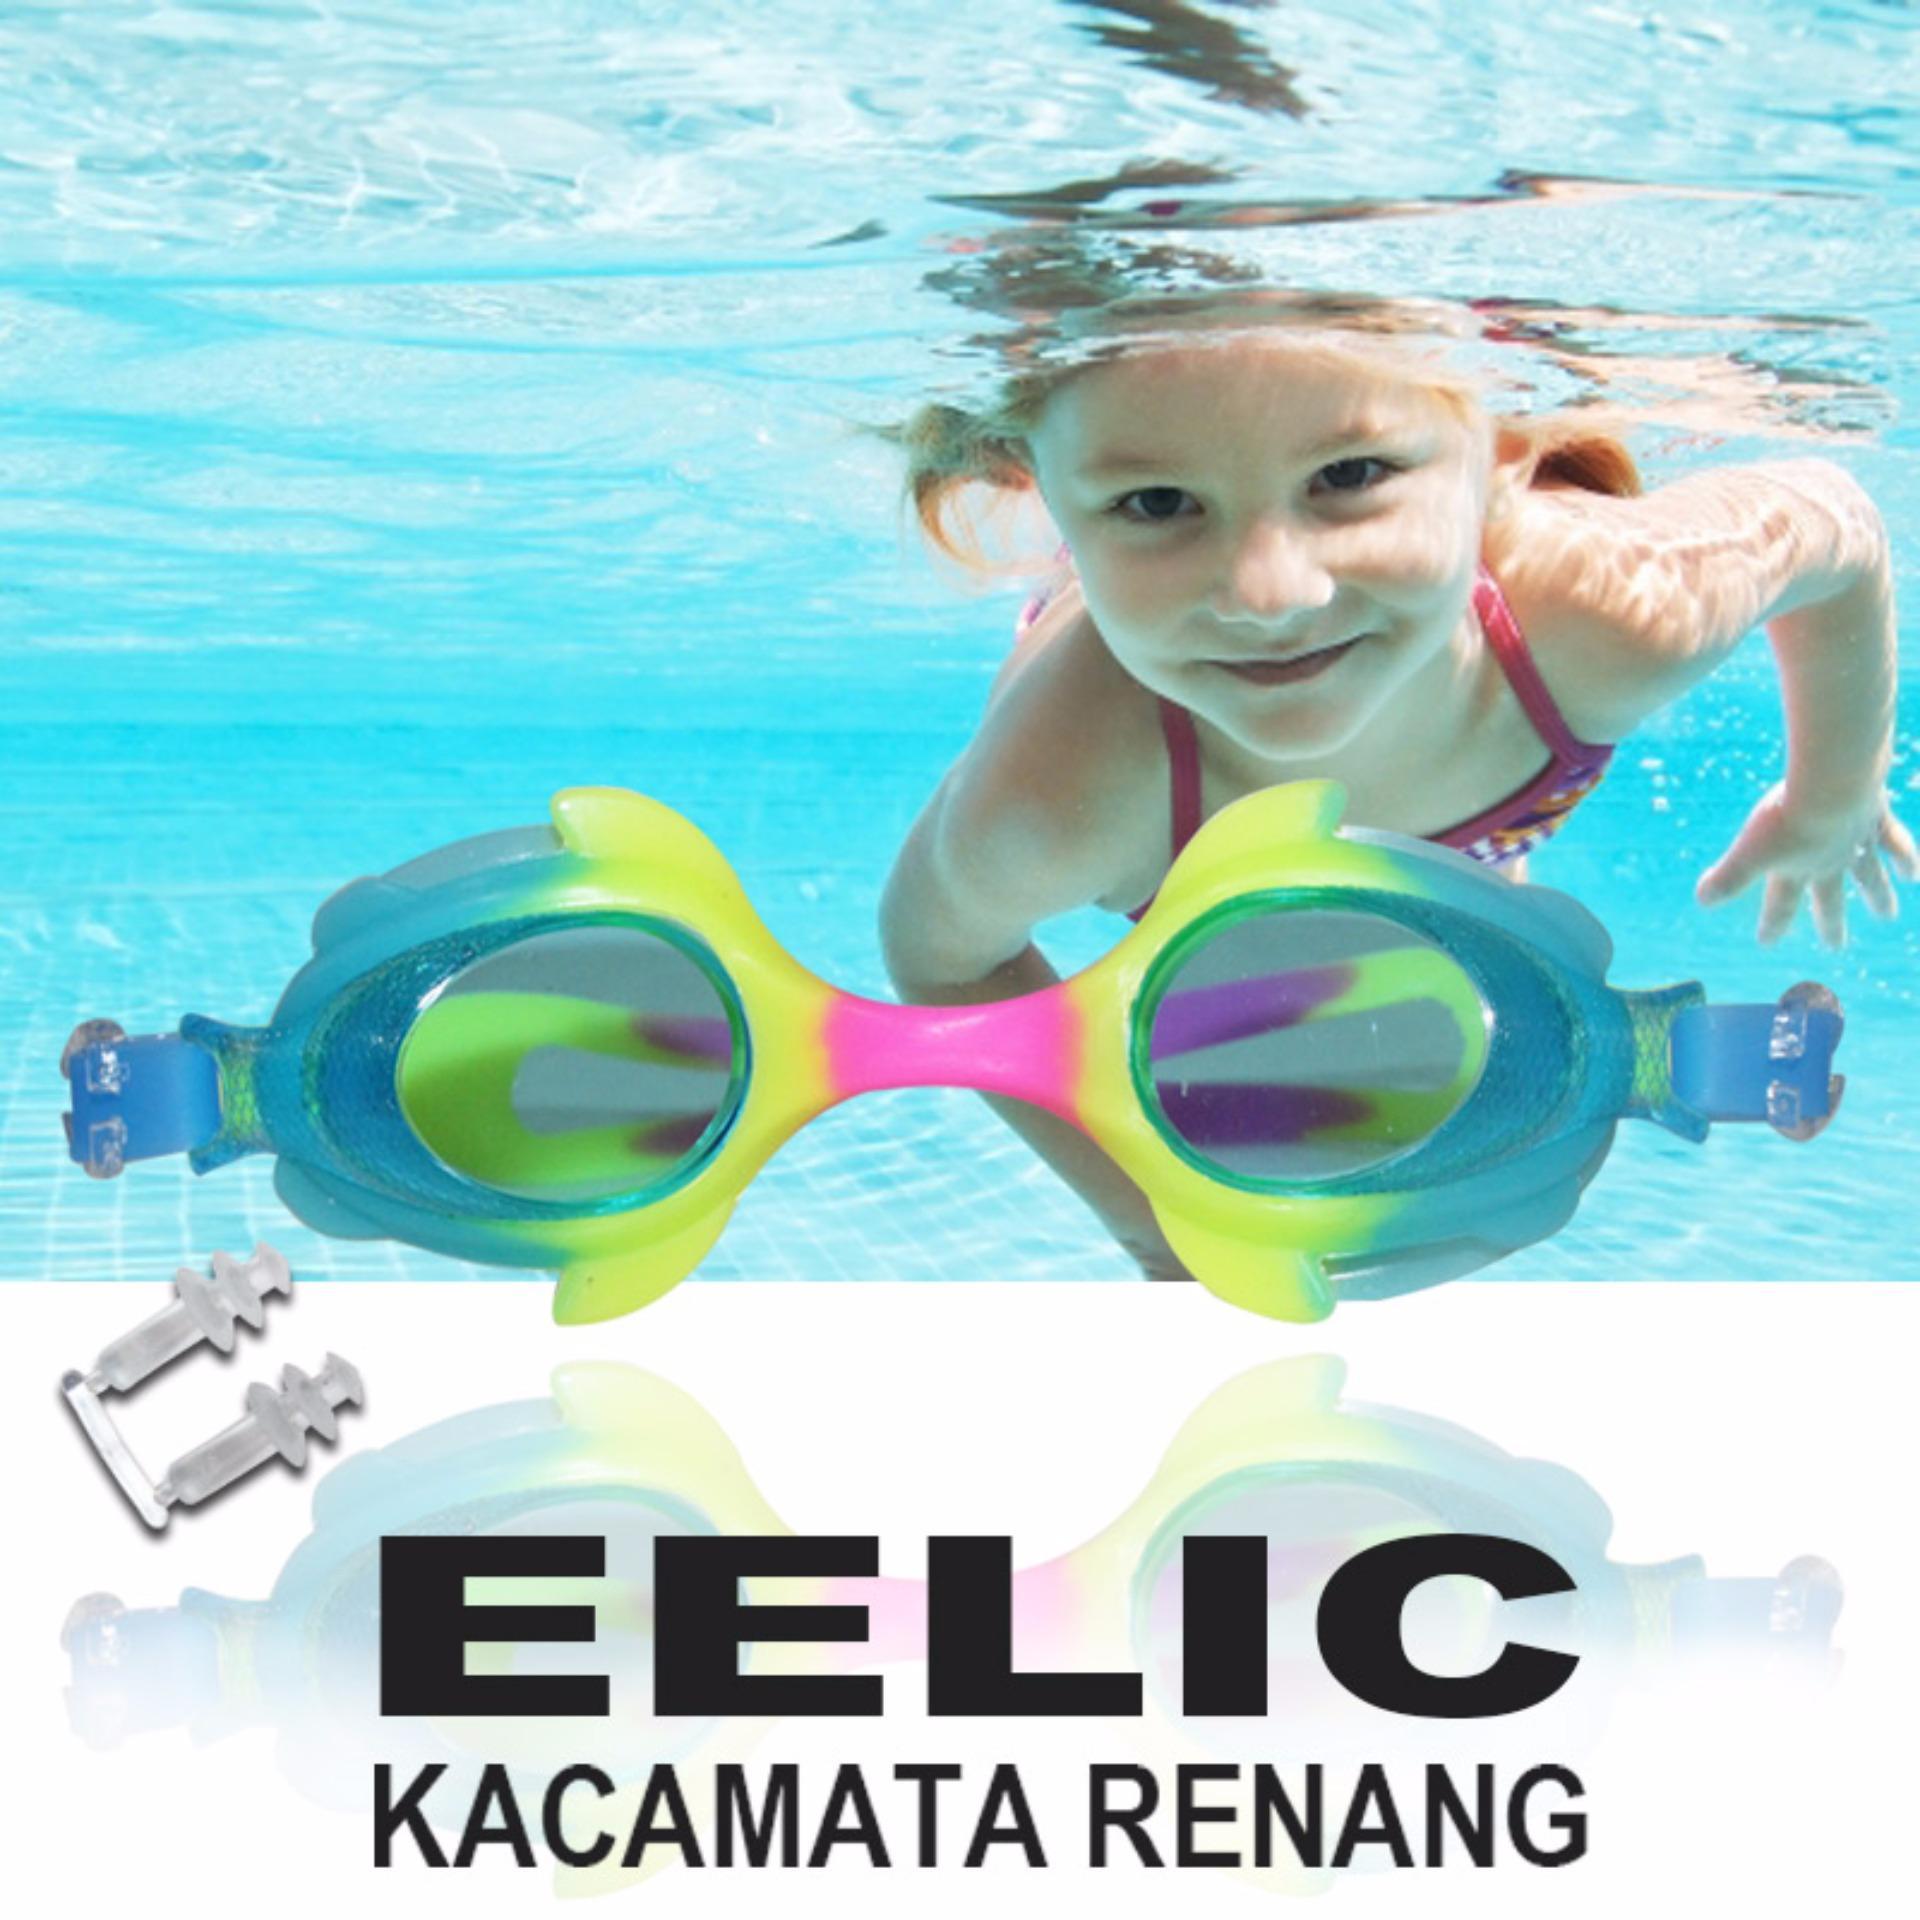 ... EELIC KAR-2800 PINK Kaca Mata Renang Anak Usia 2 - 7 Tahun ...